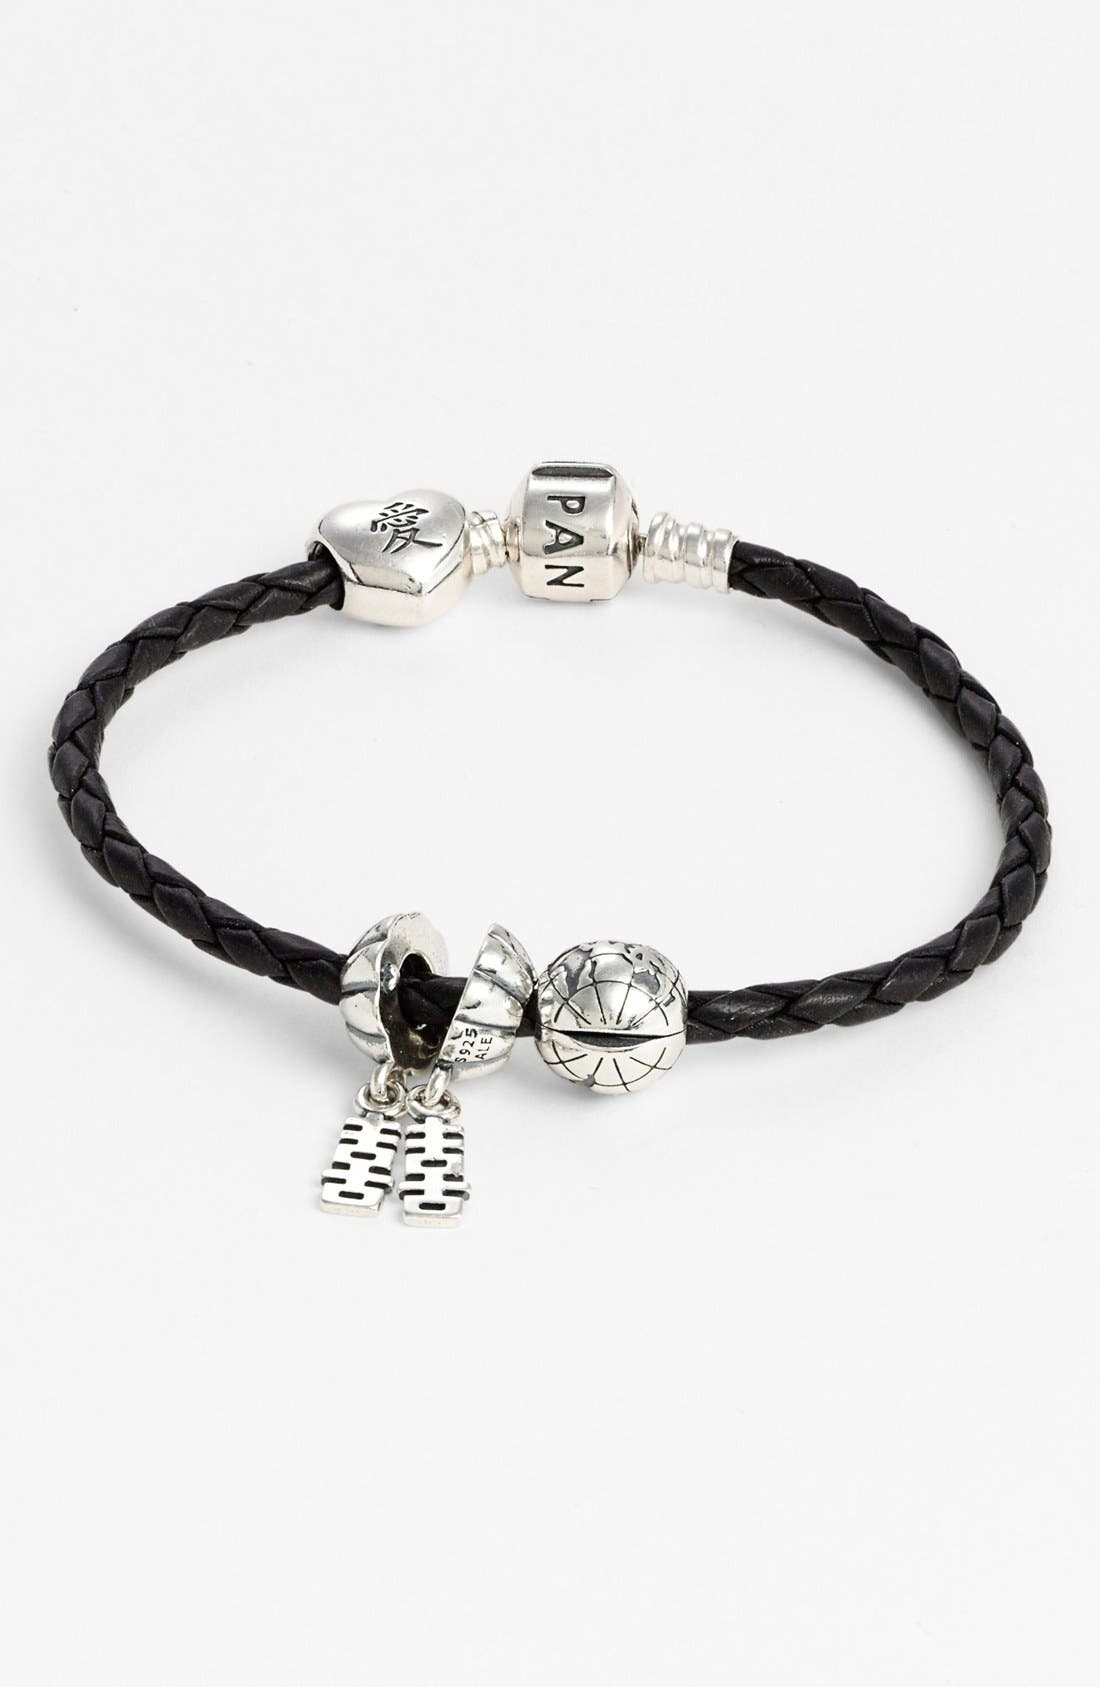 Alternate Image 1 Selected - PANDORA Woven Leather Charm Bracelet